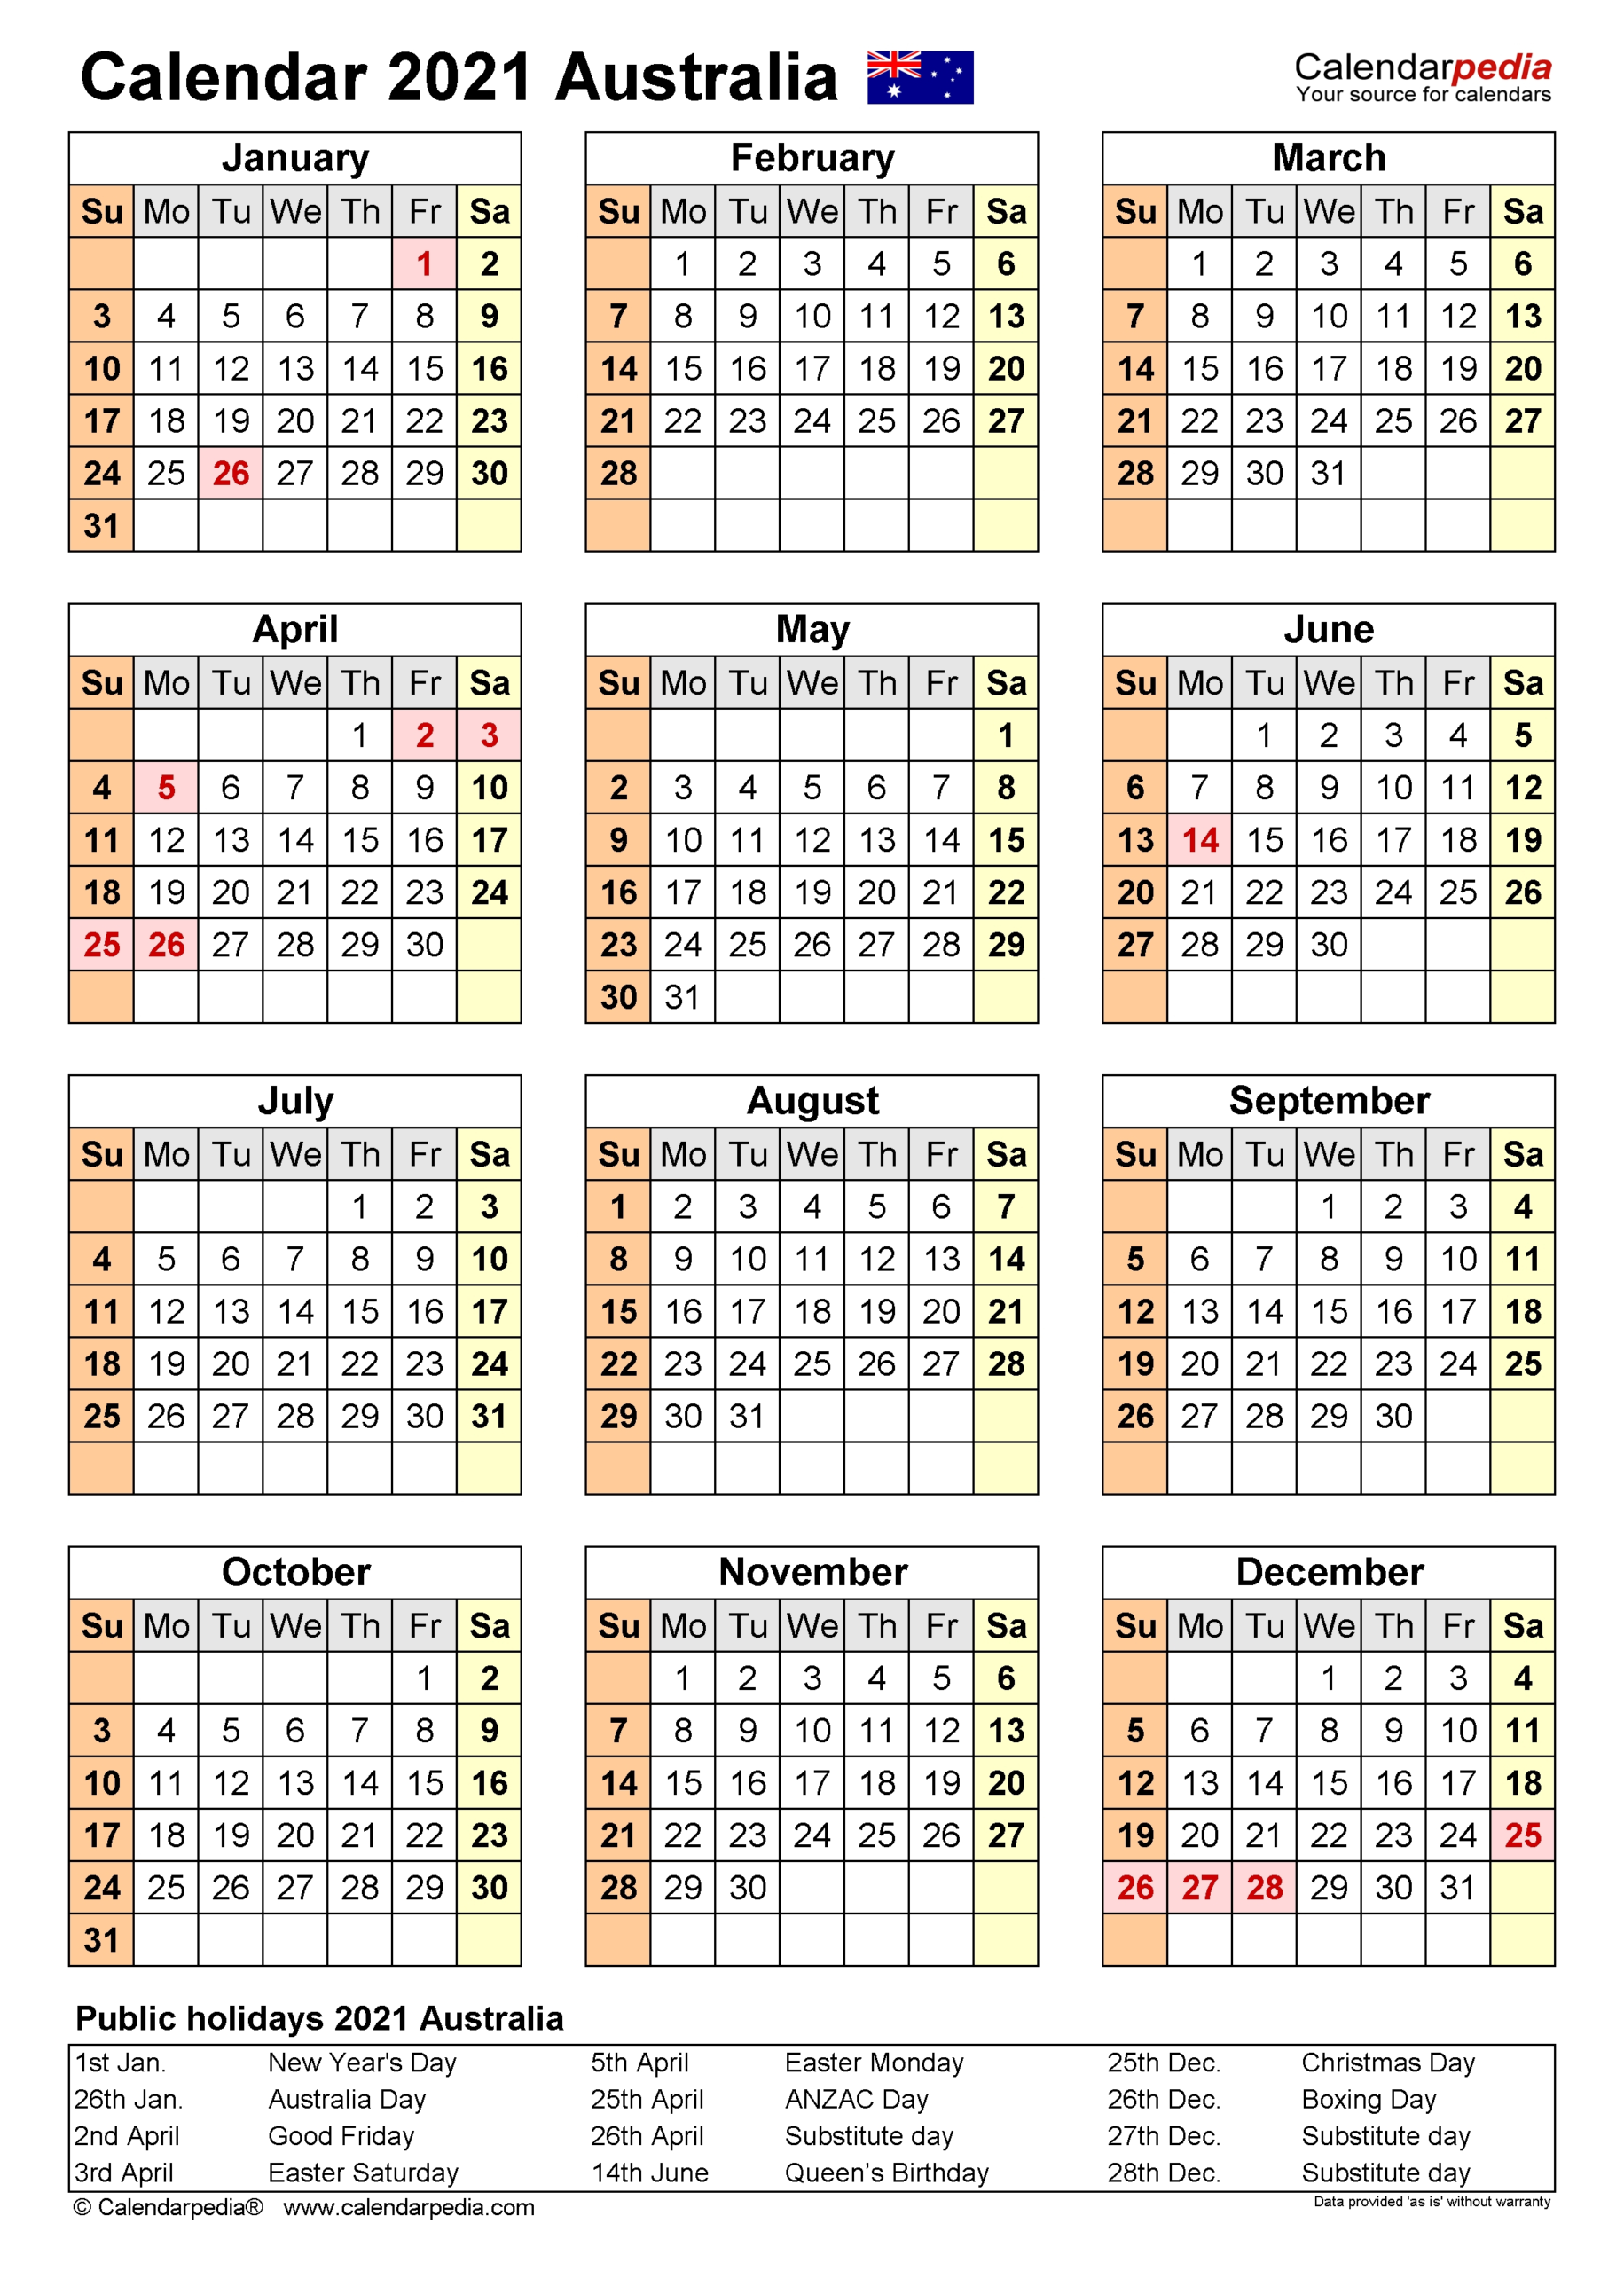 Financial Year Calendar 2021 19 Australia - Template  Fiscal Year Autralia